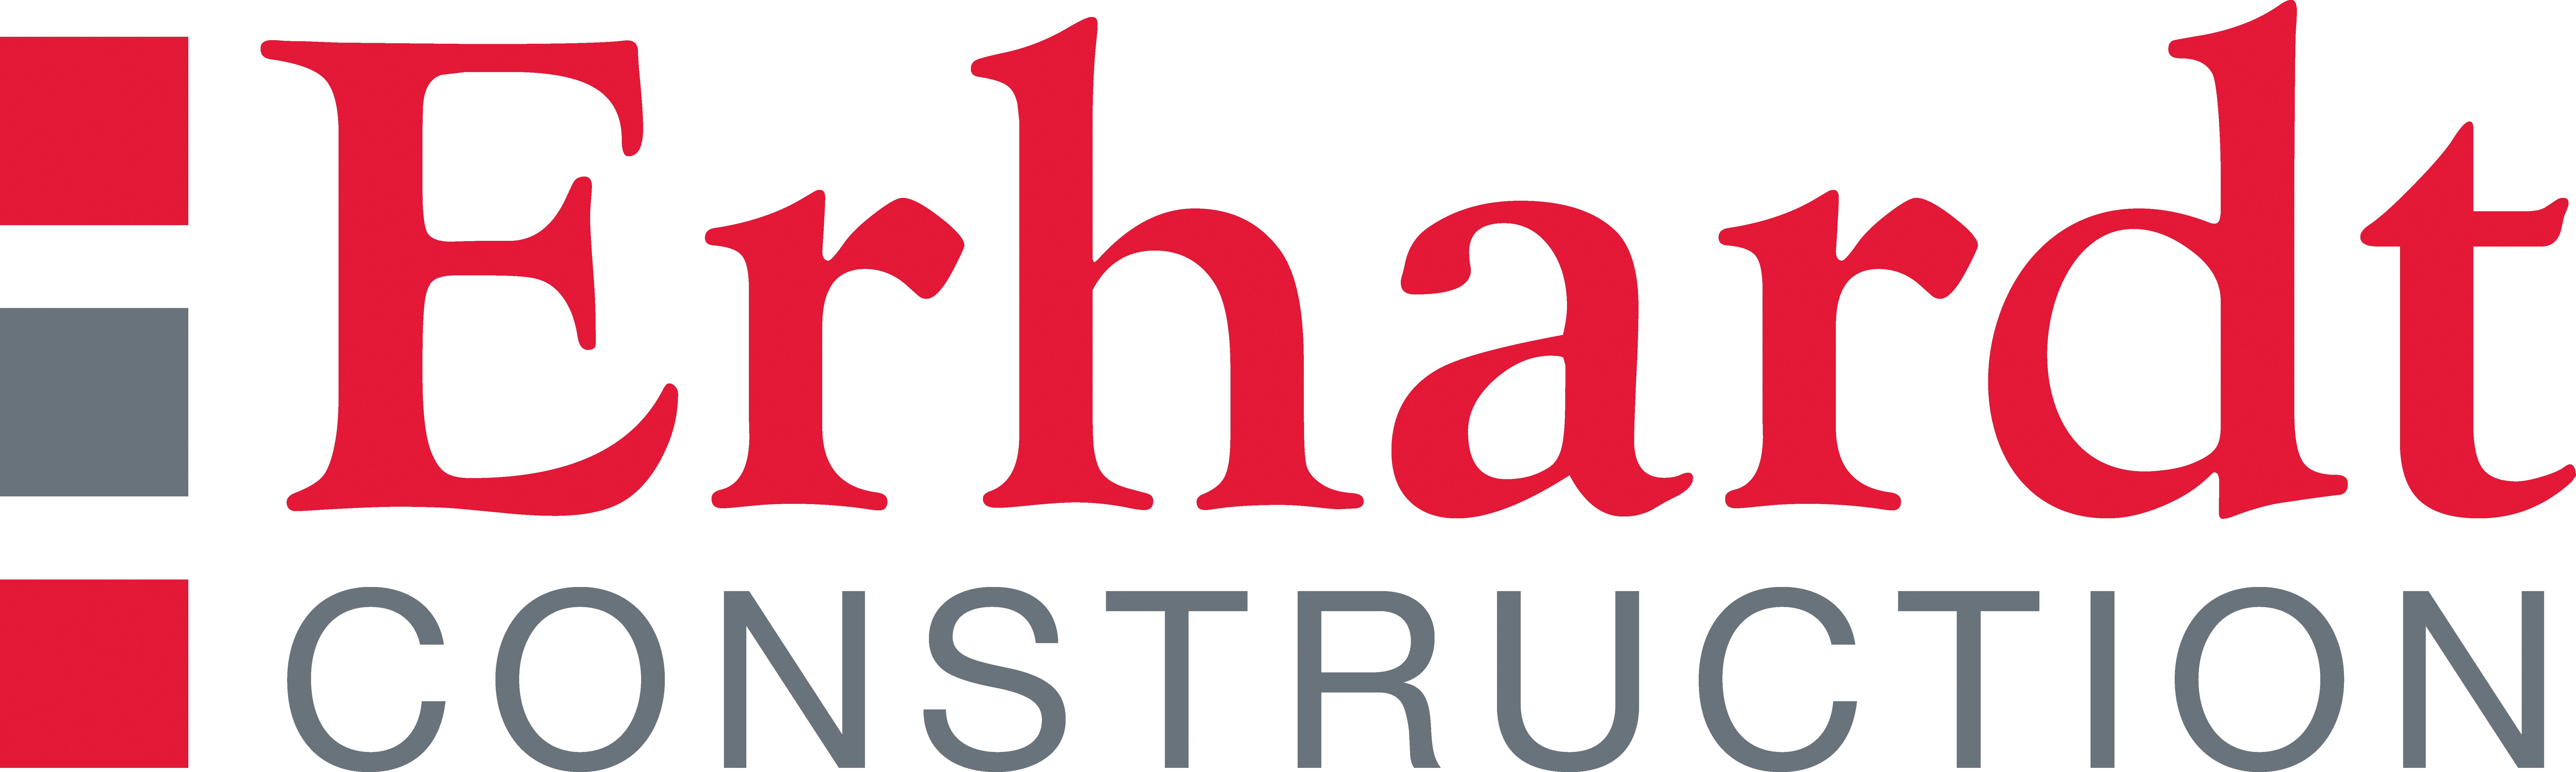 Erhardt Construction Logo